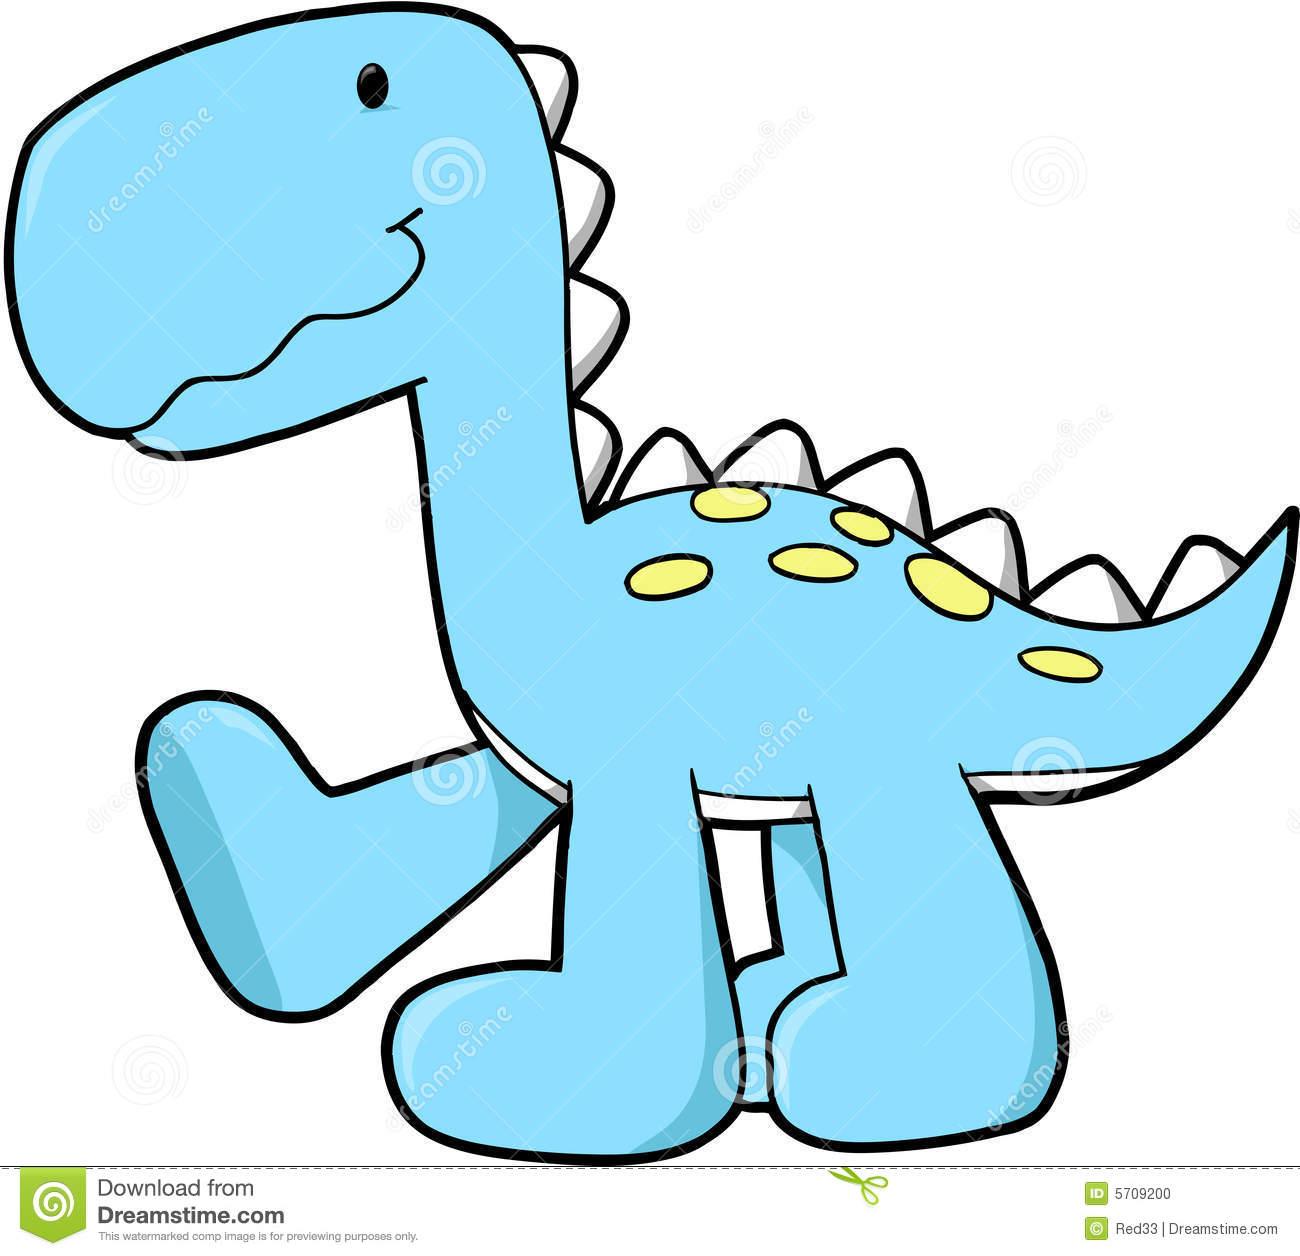 cute dinosaur clipart-cute dinosaur clipart-4